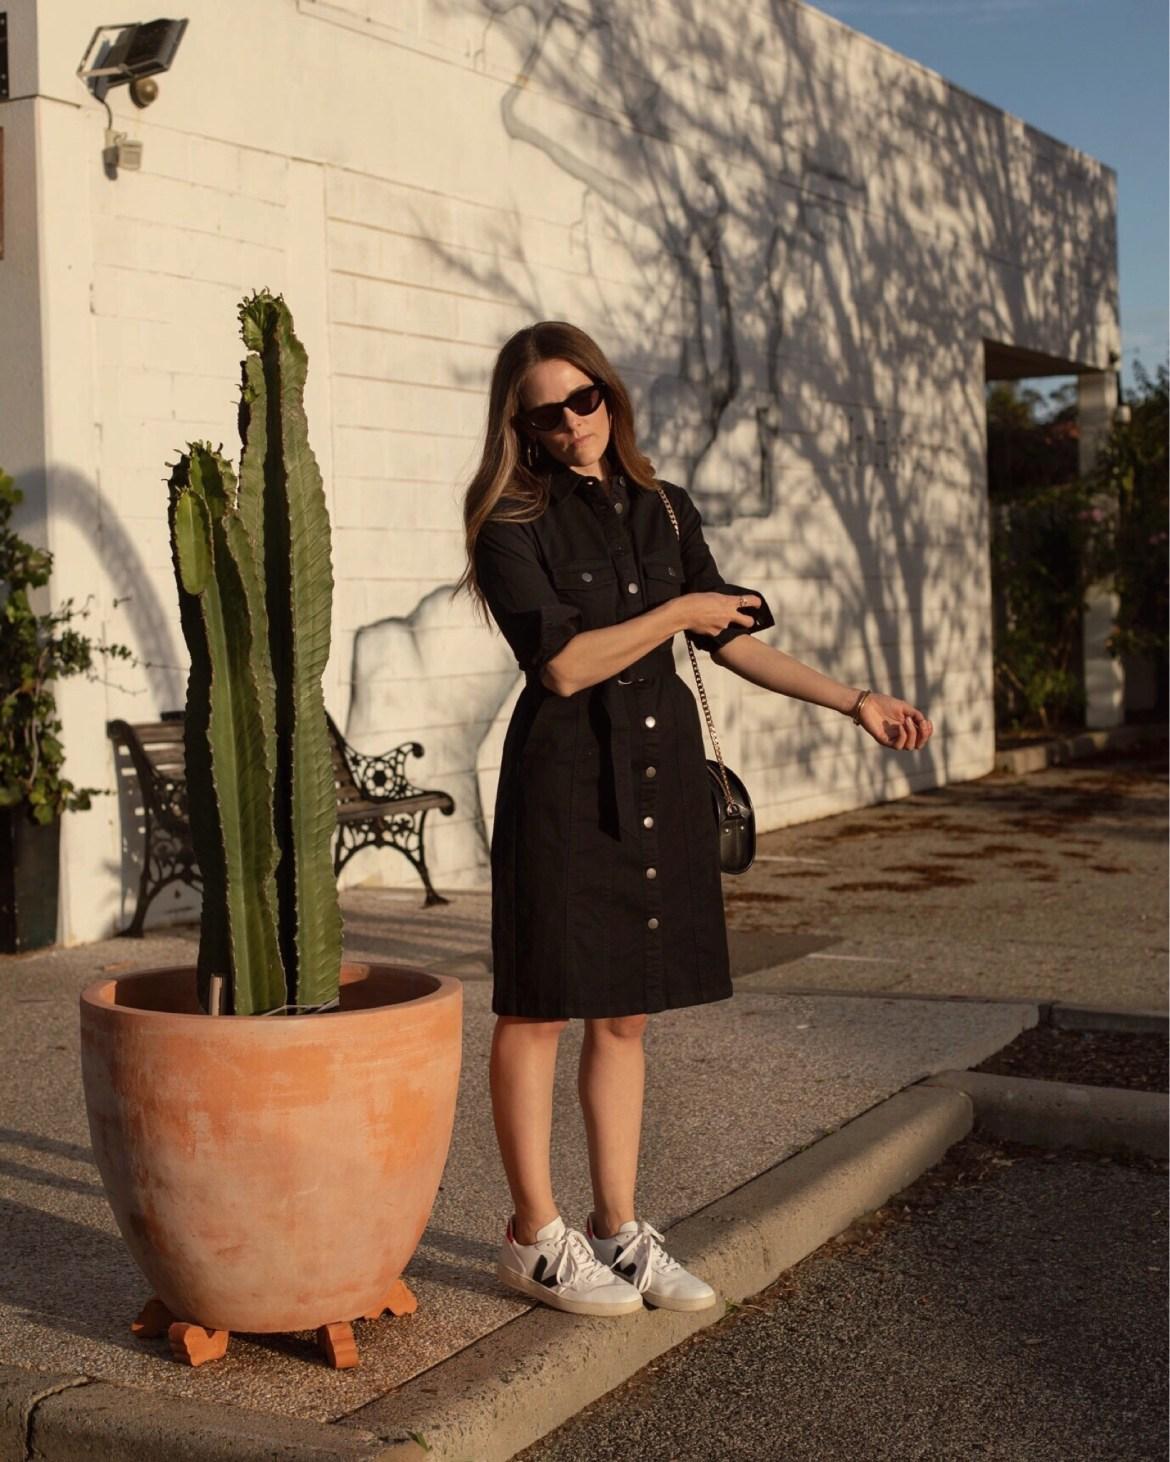 Black denim dress casual outfit idea